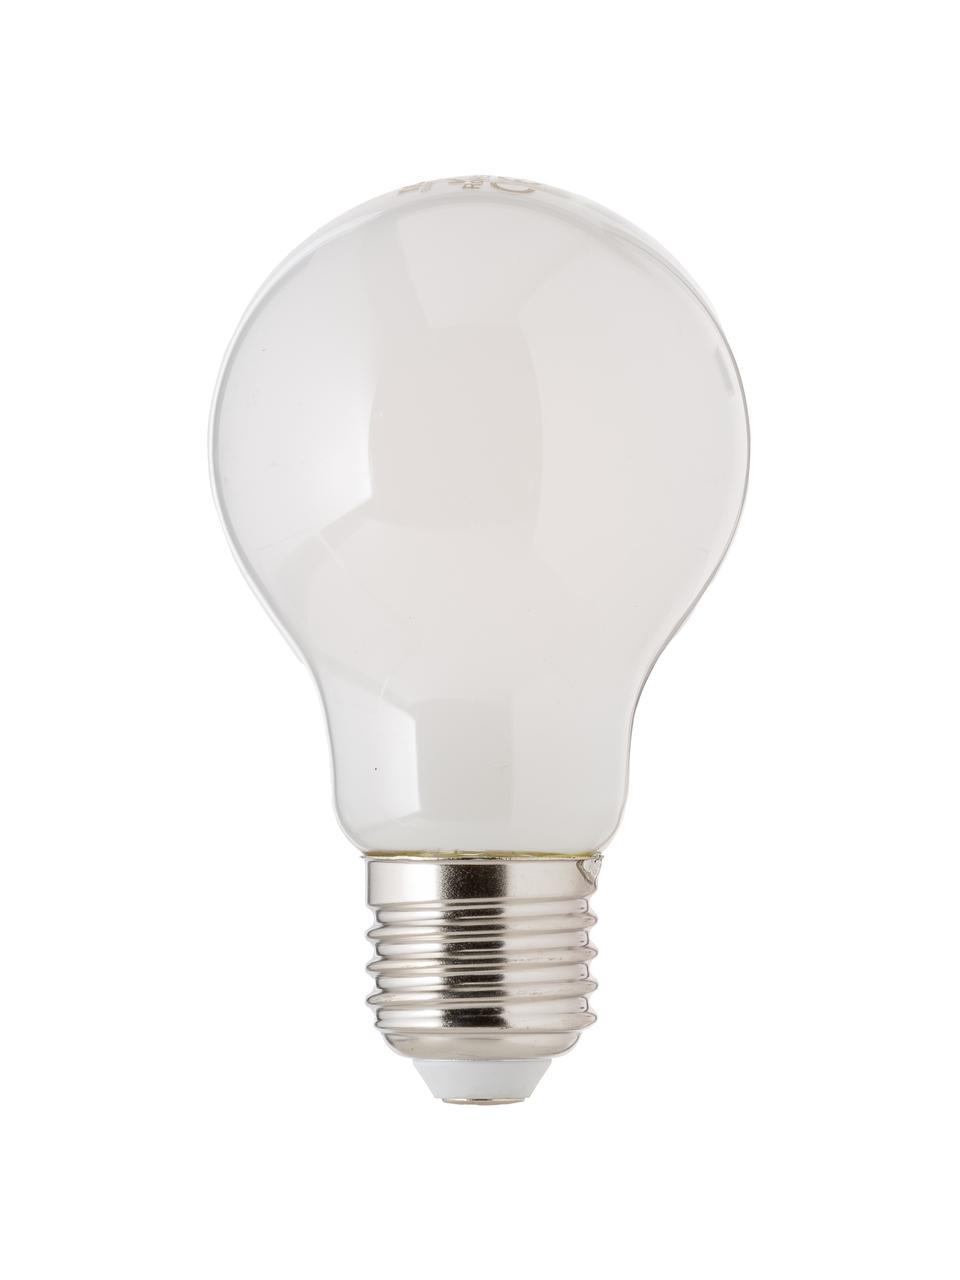 E27 Leuchtmittel, 806lm, dimmbar, warmweiß, 3 Stück, Leuchtmittelschirm: Kunststoff, Leuchtmittelfassung: Aluminium, Weiß, Ø 6 x H 10 cm